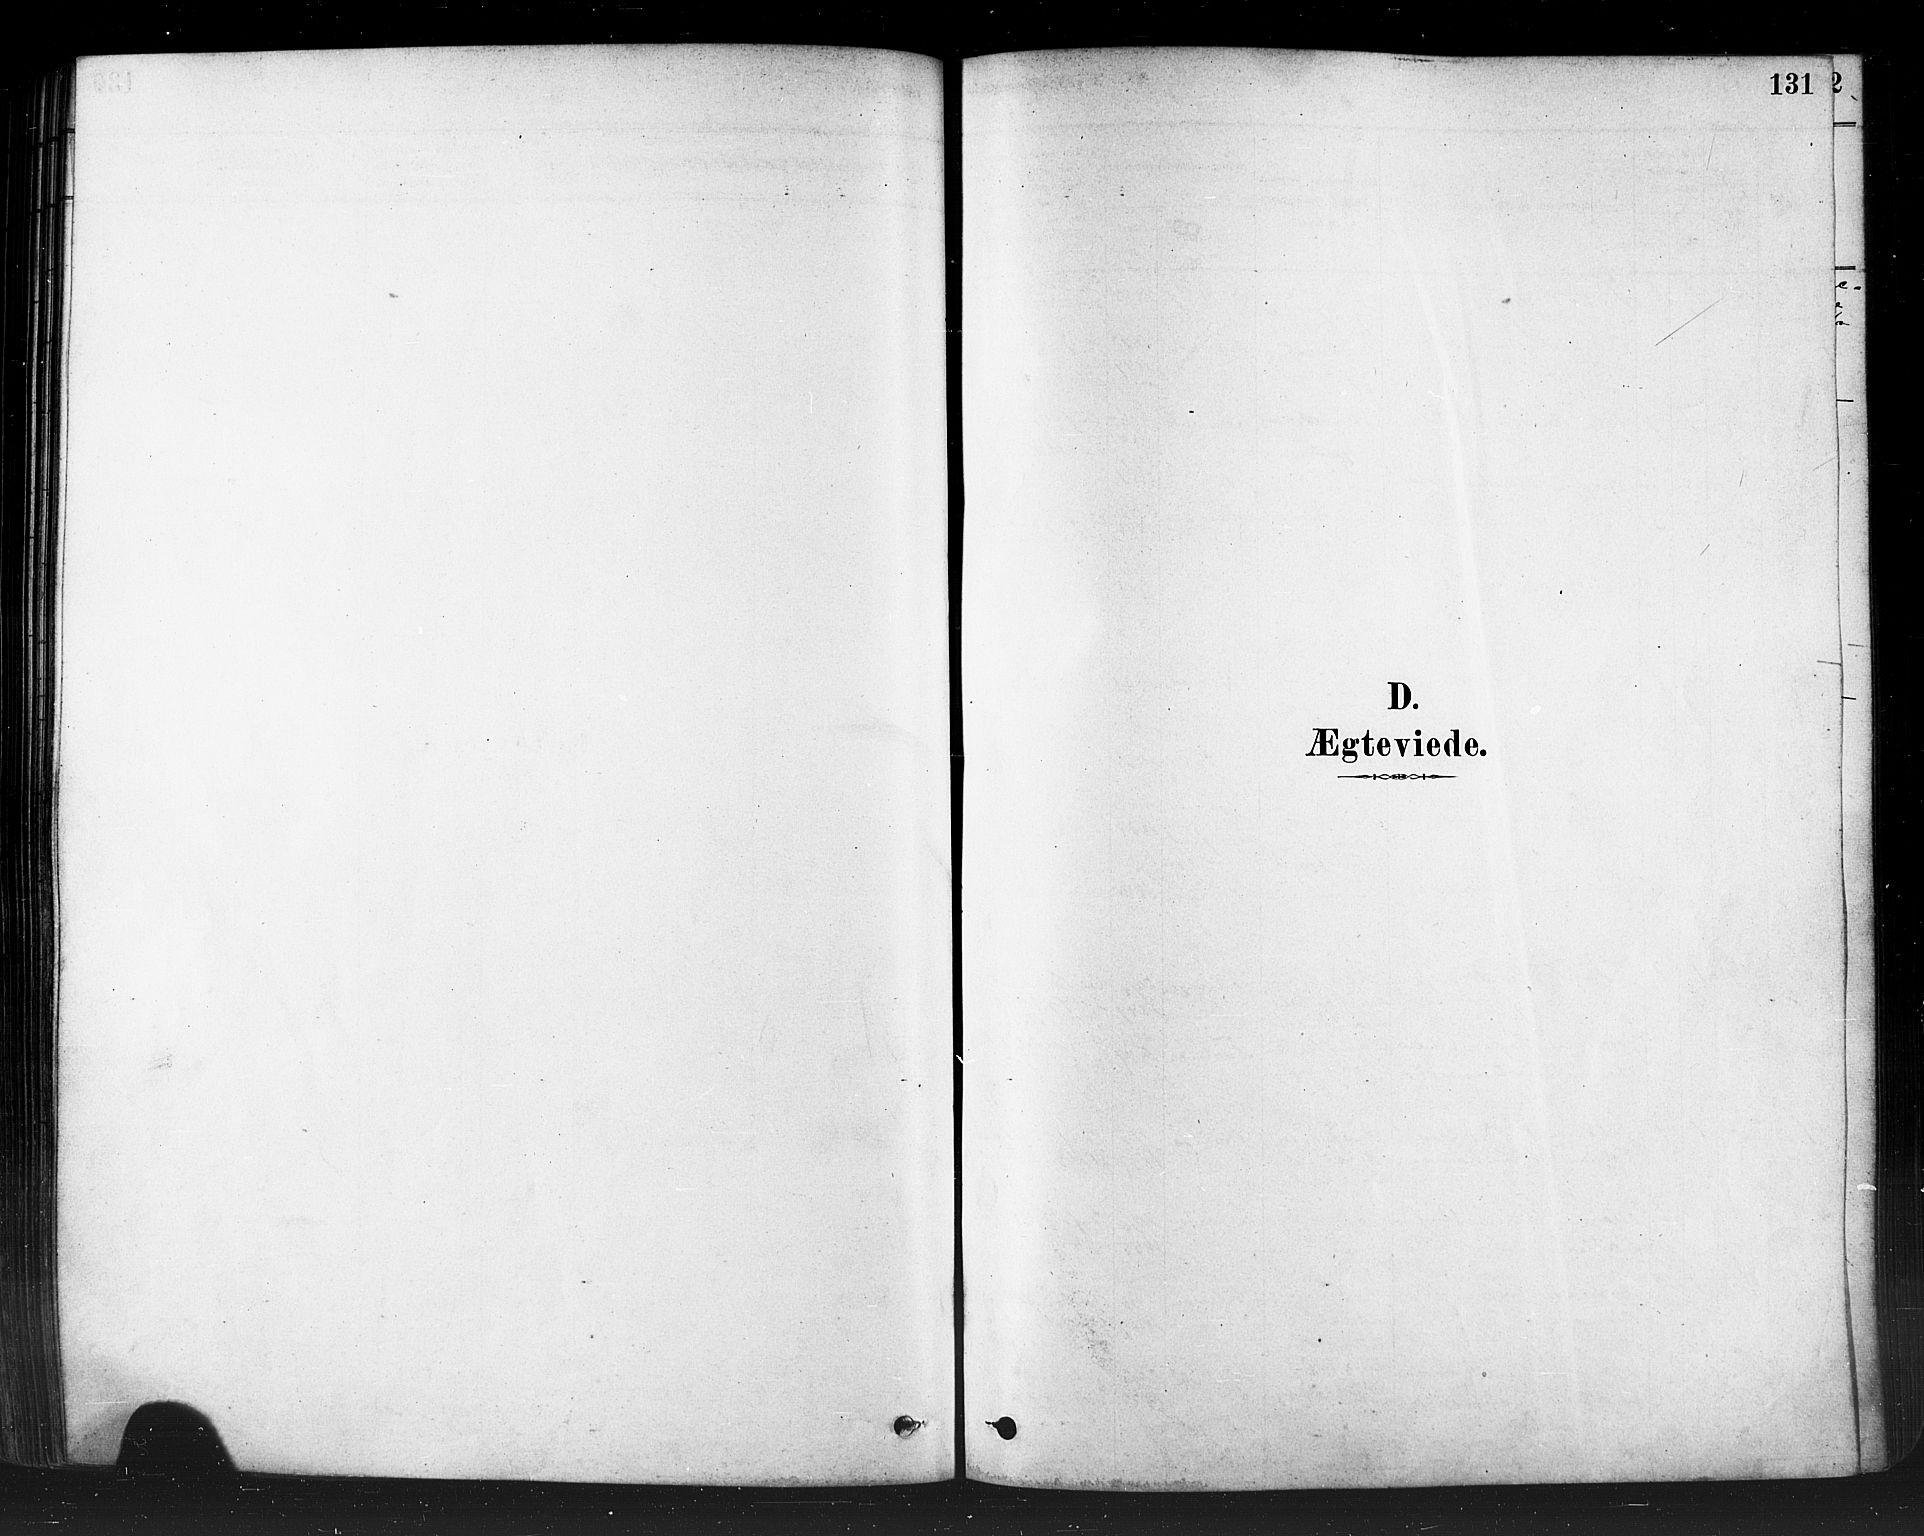 SATØ, Måsøy sokneprestkontor, H/Ha/L0004kirke: Ministerialbok nr. 4, 1878-1891, s. 131